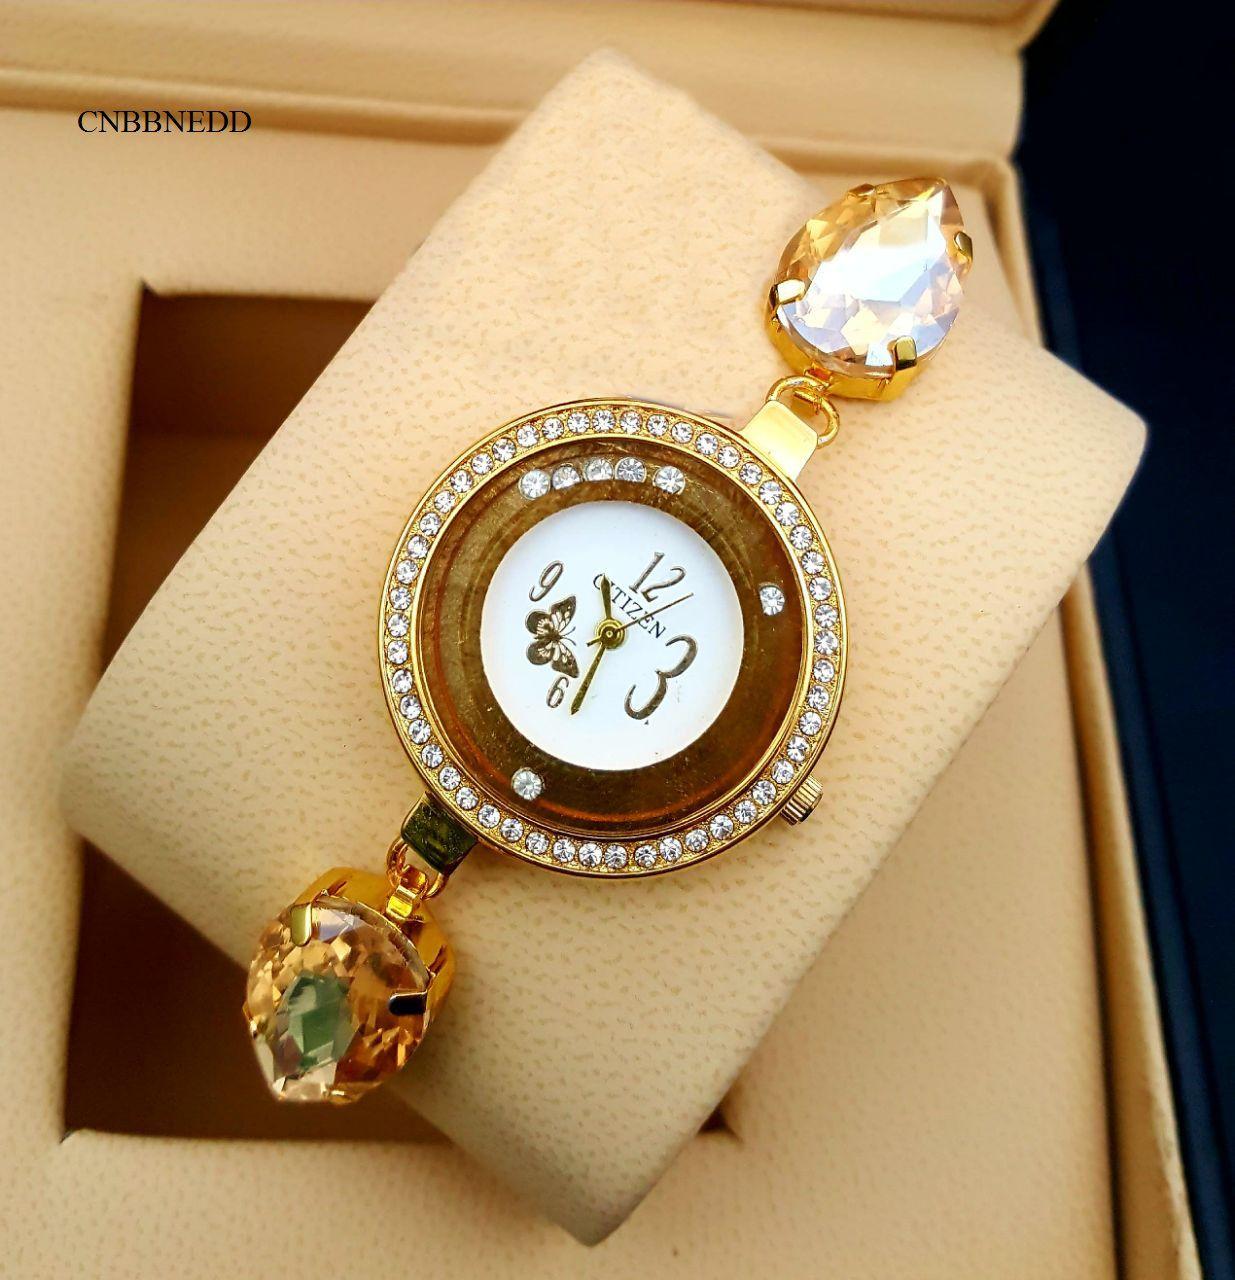 06bf0c4b9 Imitation Imitation Jewellery Watches Manufacturers Milan, Imitation  Imitation Jewellery Watches Manufacturers Munich, Imitation Imitation  Jewellery Watches ...